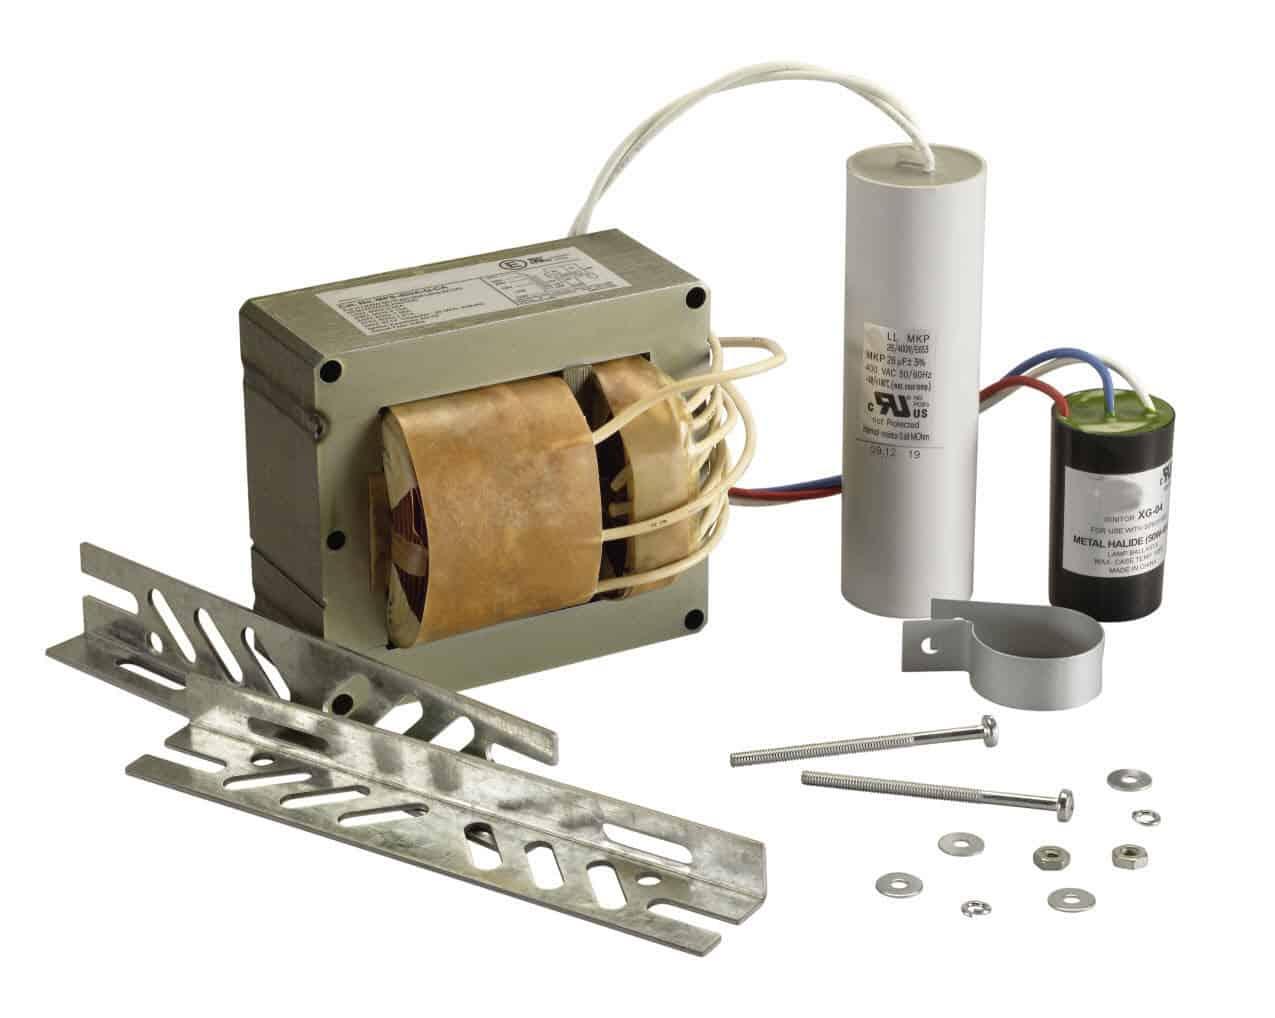 hight resolution of how to install a hid ballast rh dynamicballast com high pressure sodium ballast wiring diagram metal halide wiring schematic